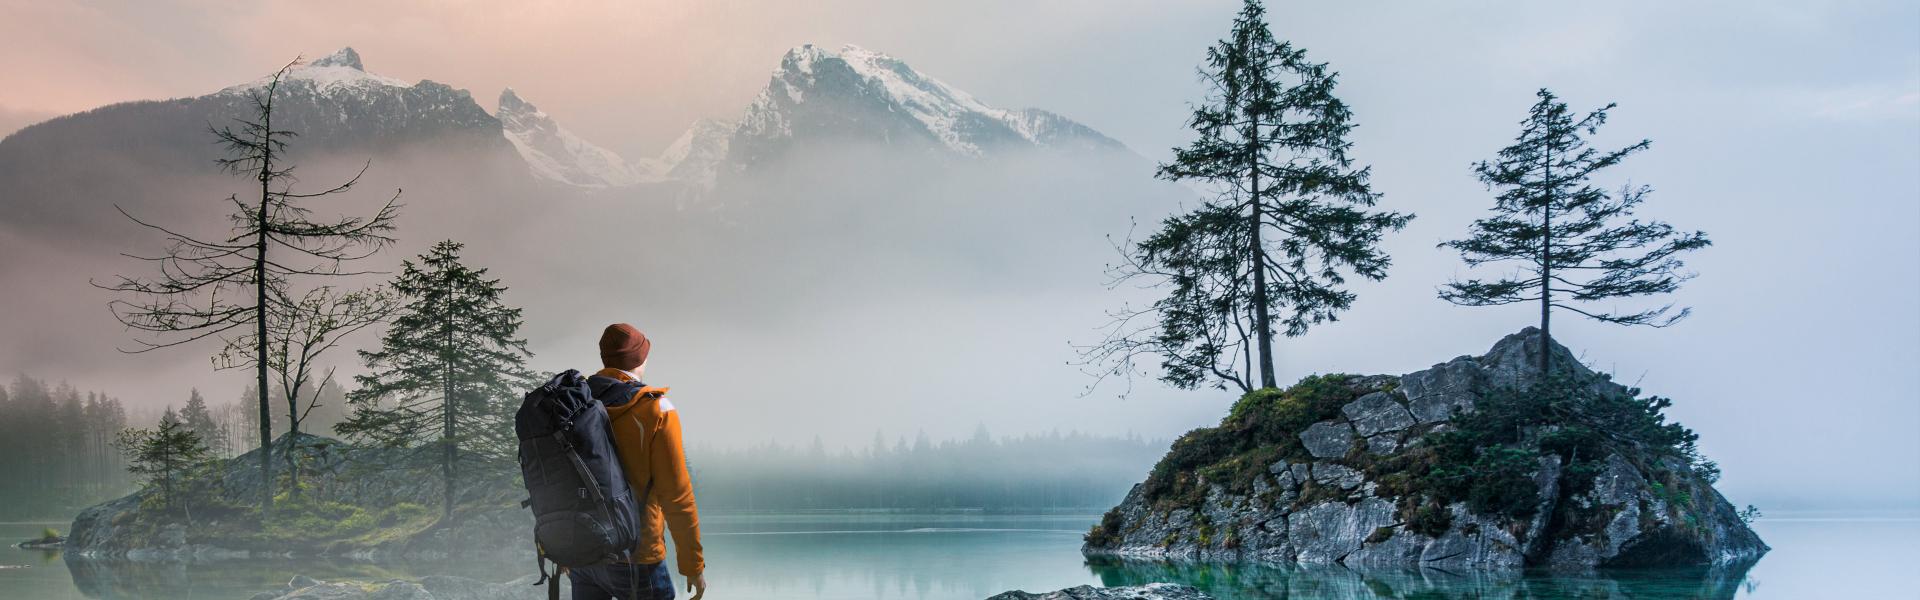 Wandern in den kanadischen Rockies